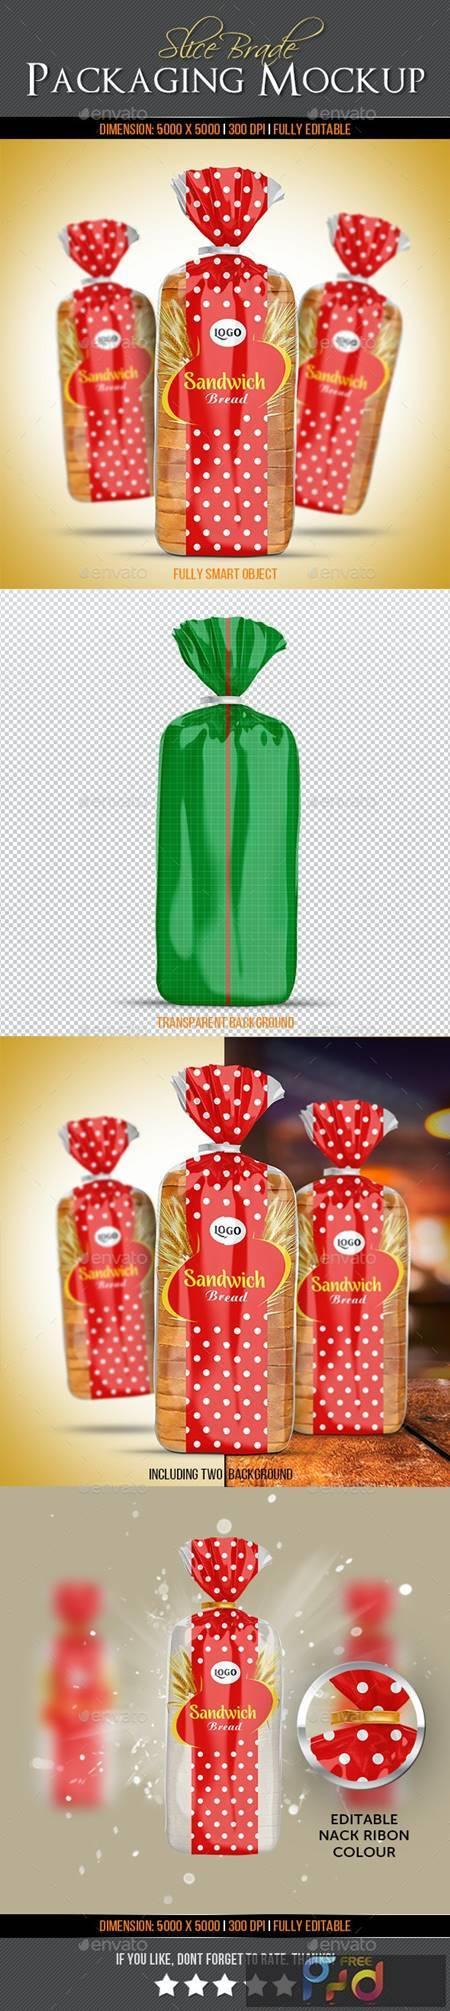 Slice Bread Packaging Mock-Up 22922839 1